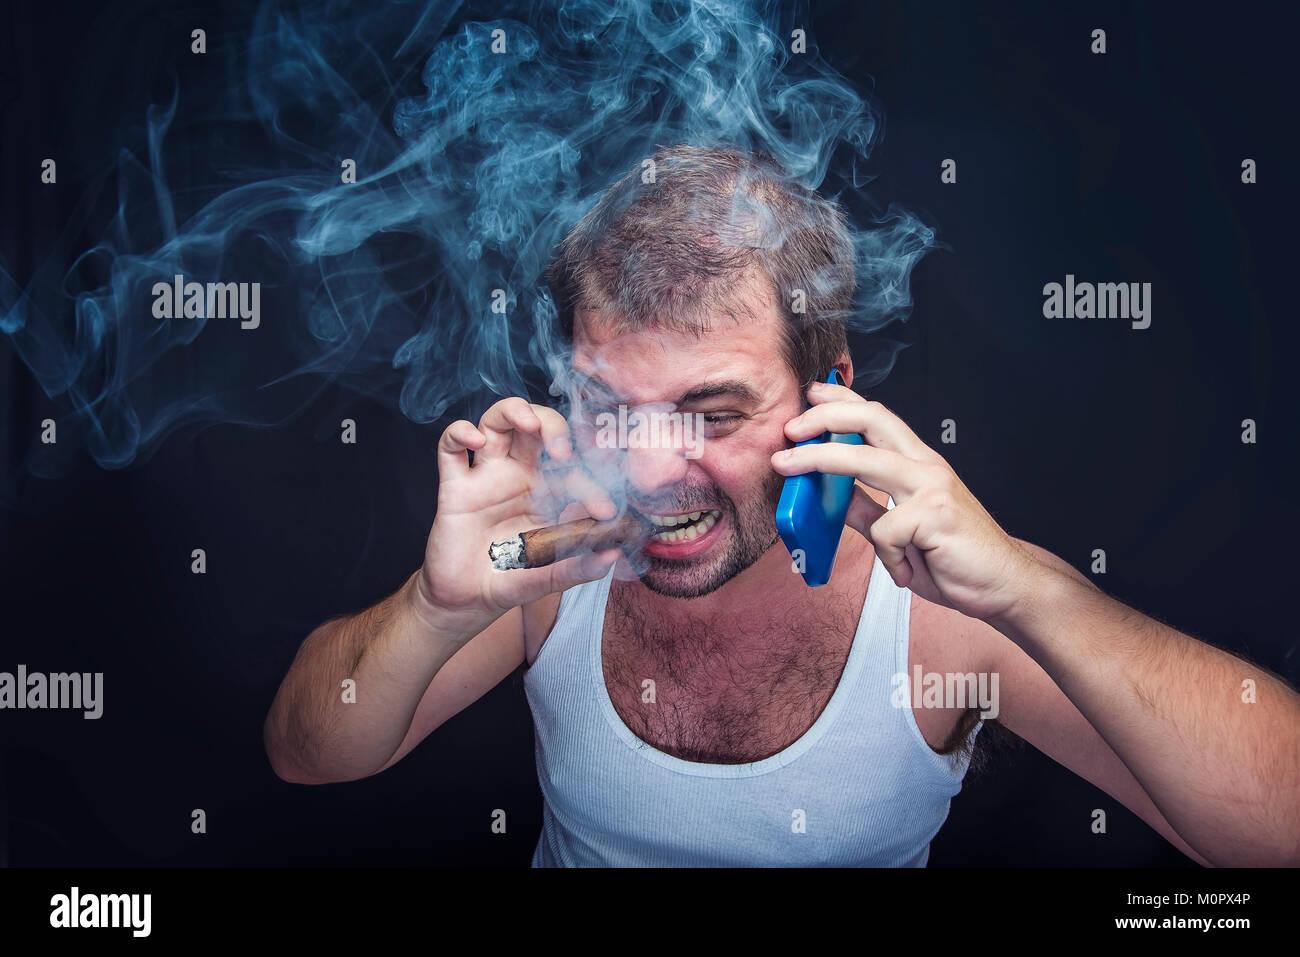 Rude smoking man yelling at his cell phone - Stock Image